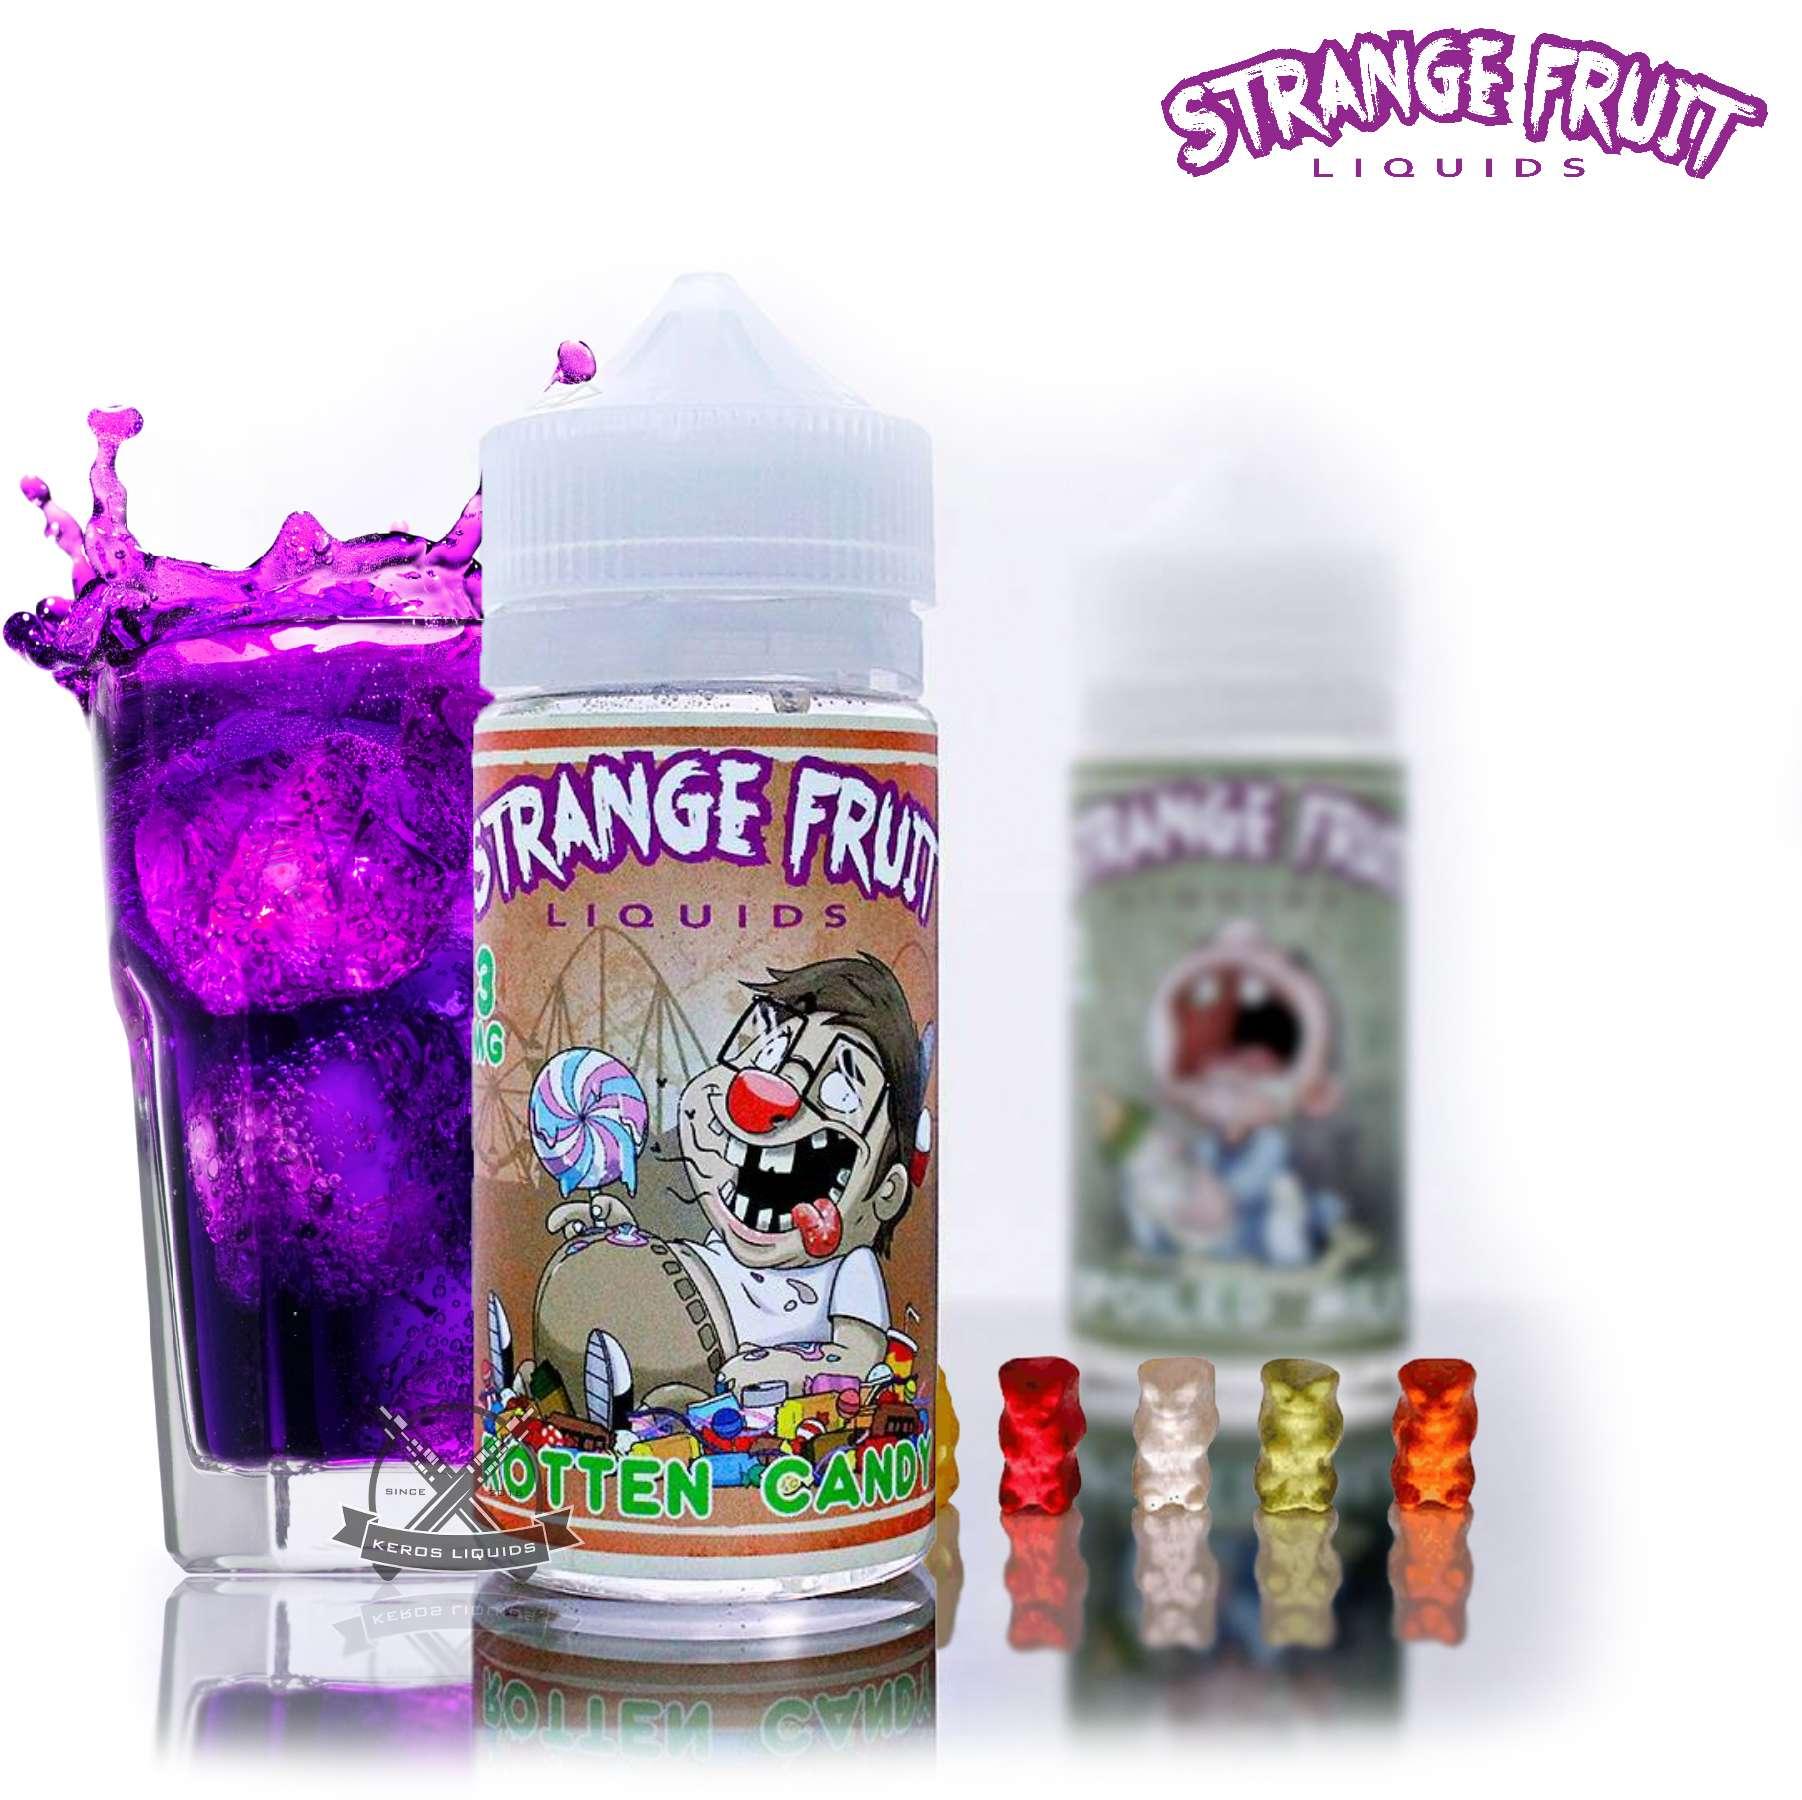 Strange Fruit Rotten Candy Plus Liquids Liquid Vaporizer Frosty Juice Kerosliquids